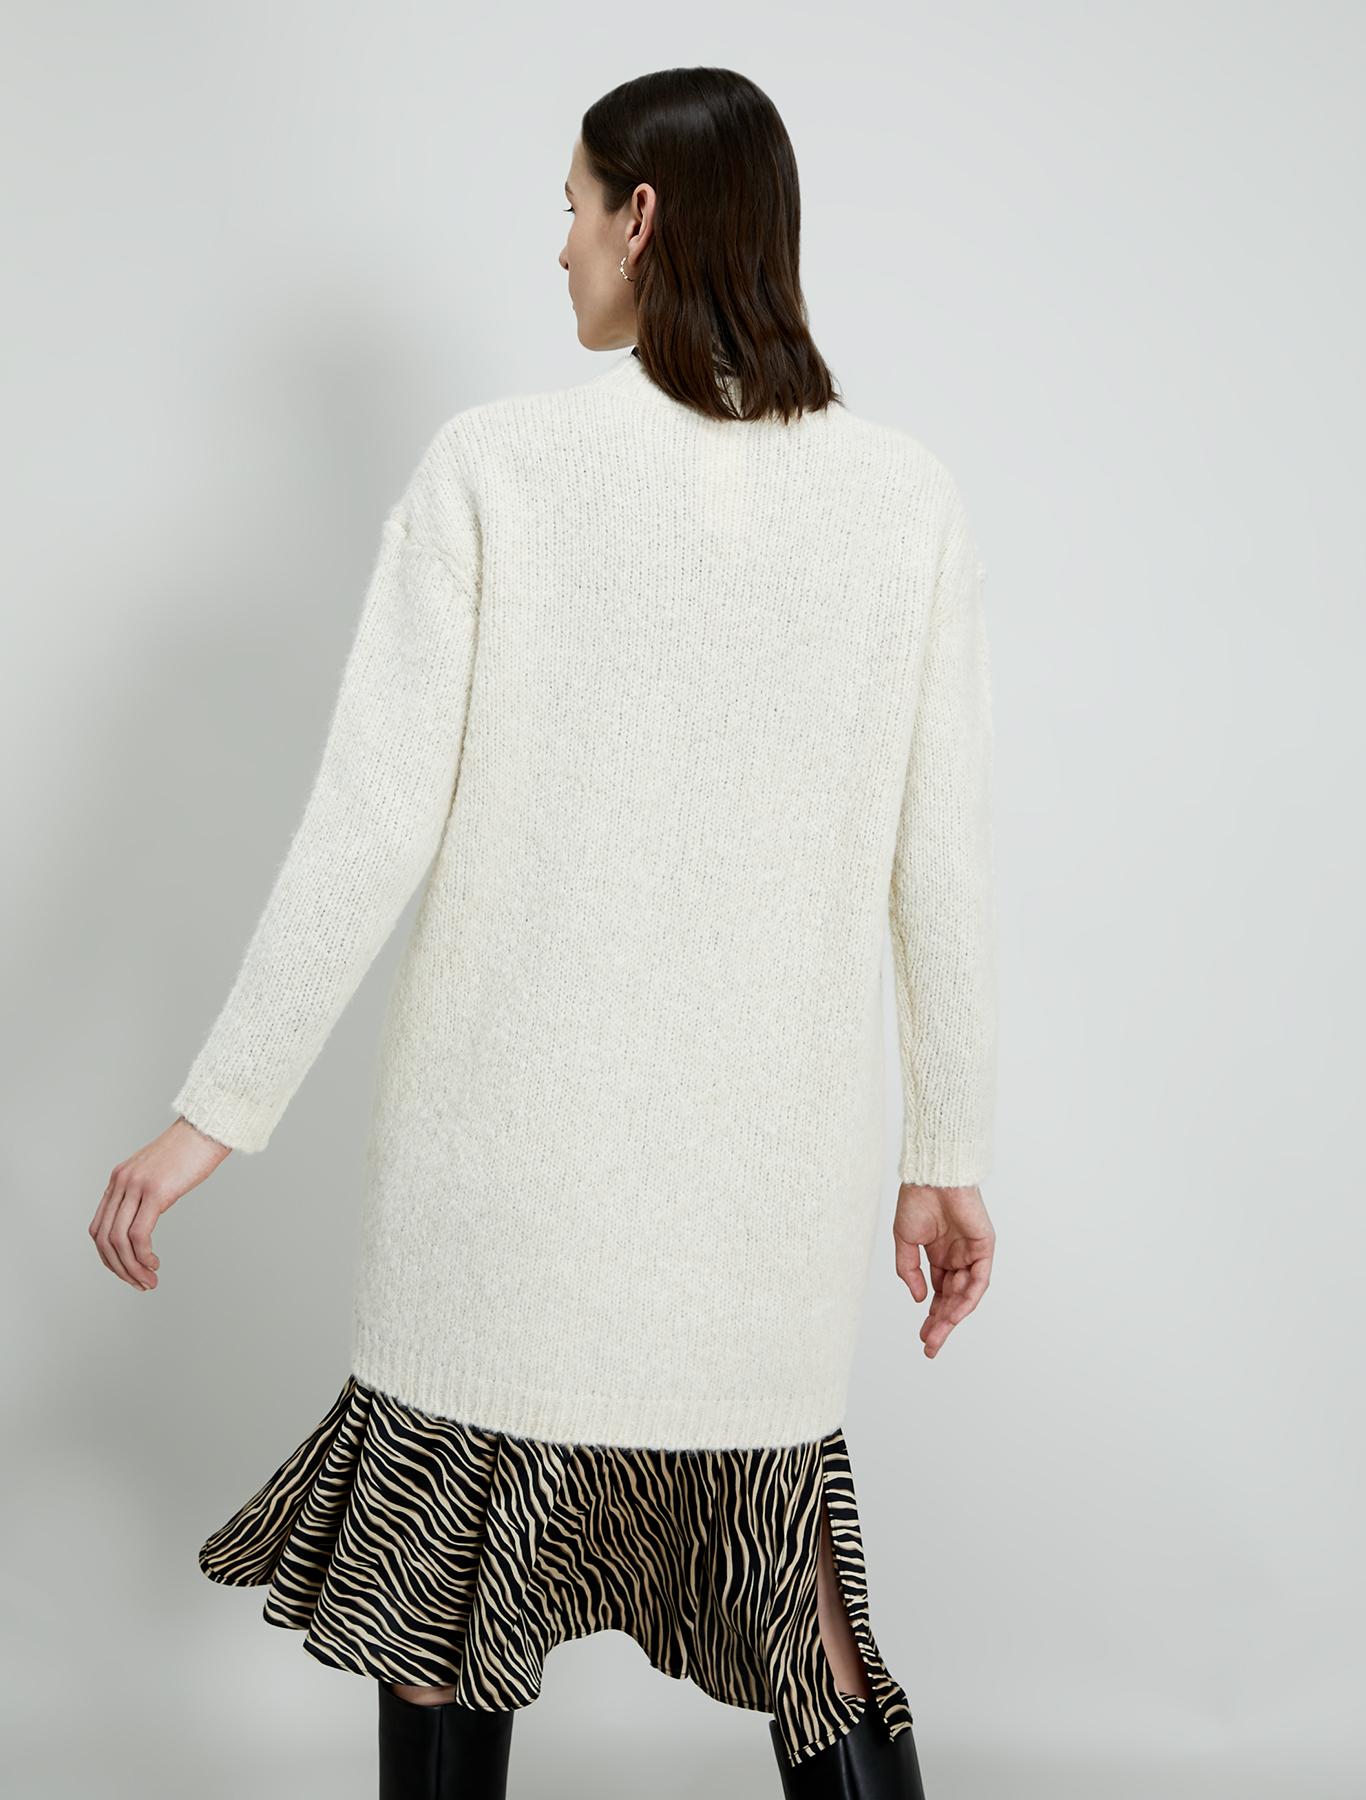 Jumper dress in alpaca and wool - ivory - pennyblack